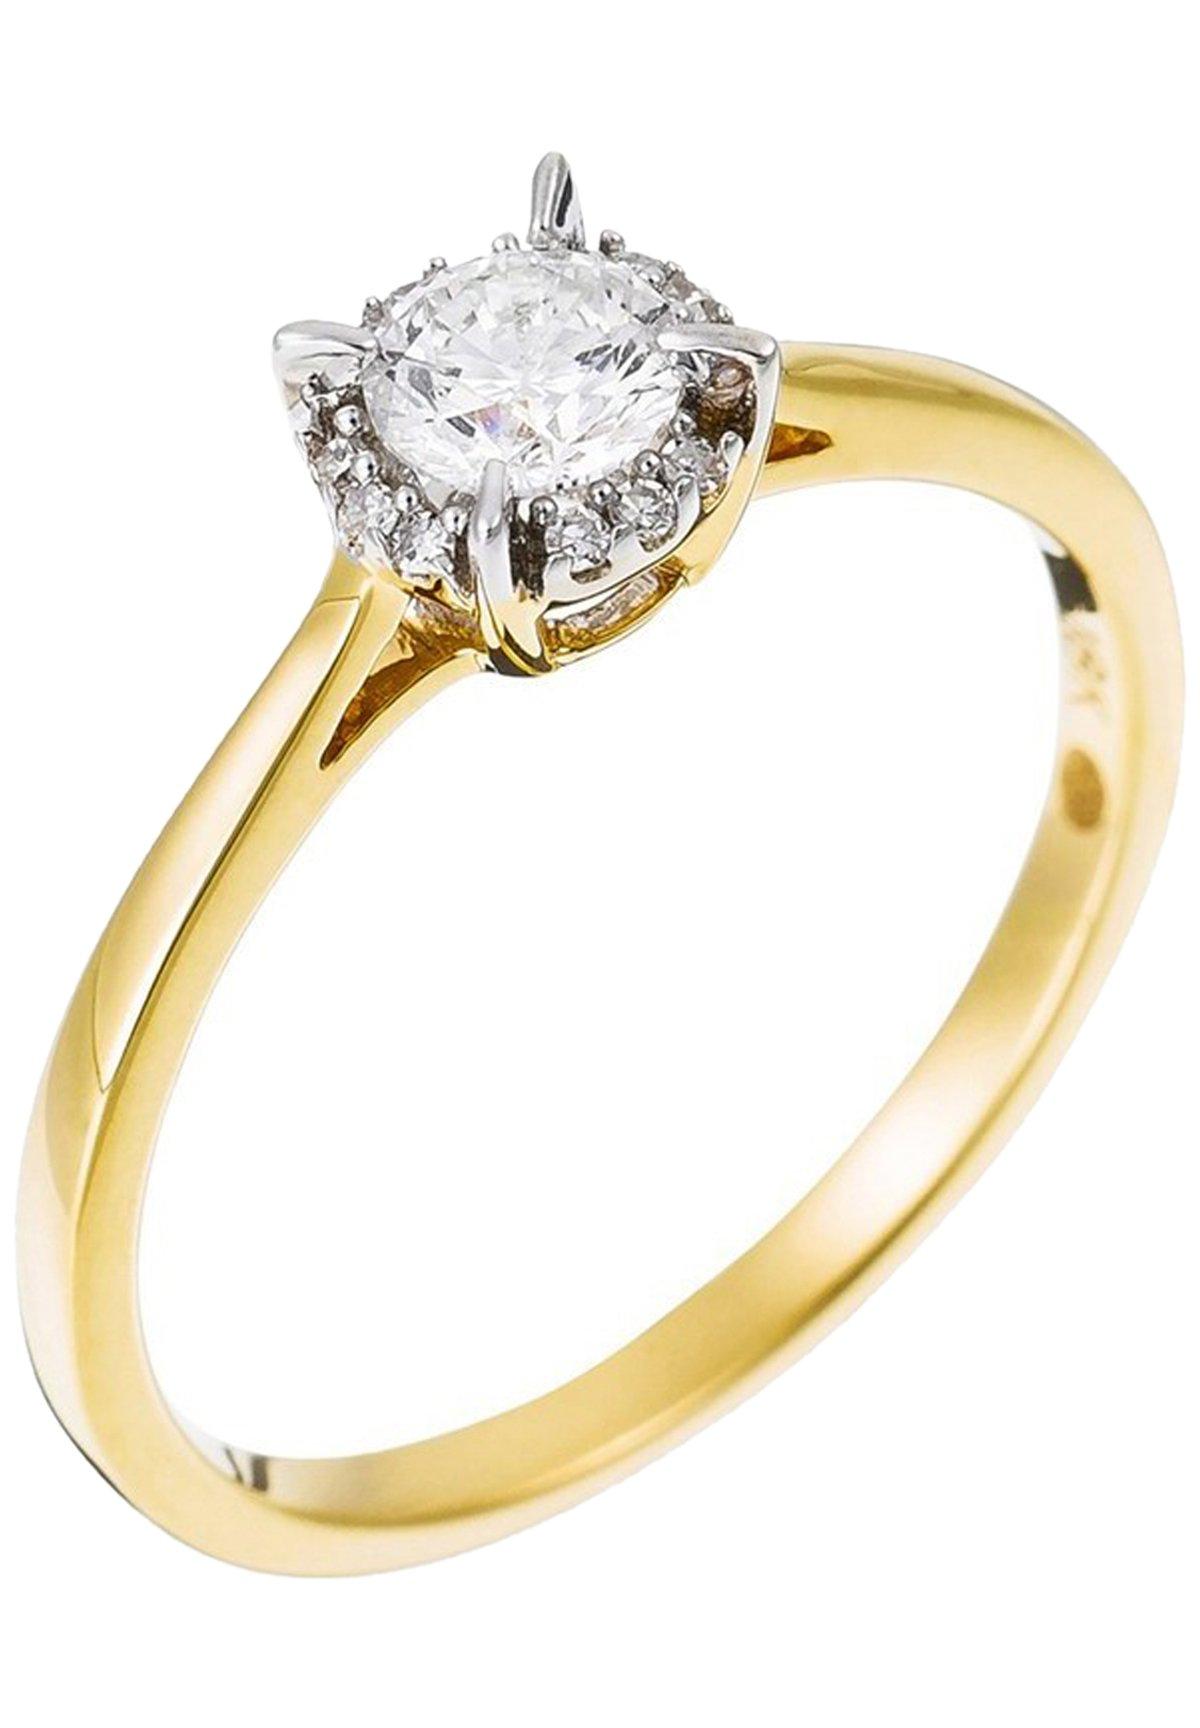 Damen 18K YELLOW GOLD RING  CERTIFIED 13 DIAMONDS HSI AND 12 DIAMONDS 0.03 CT - Ring